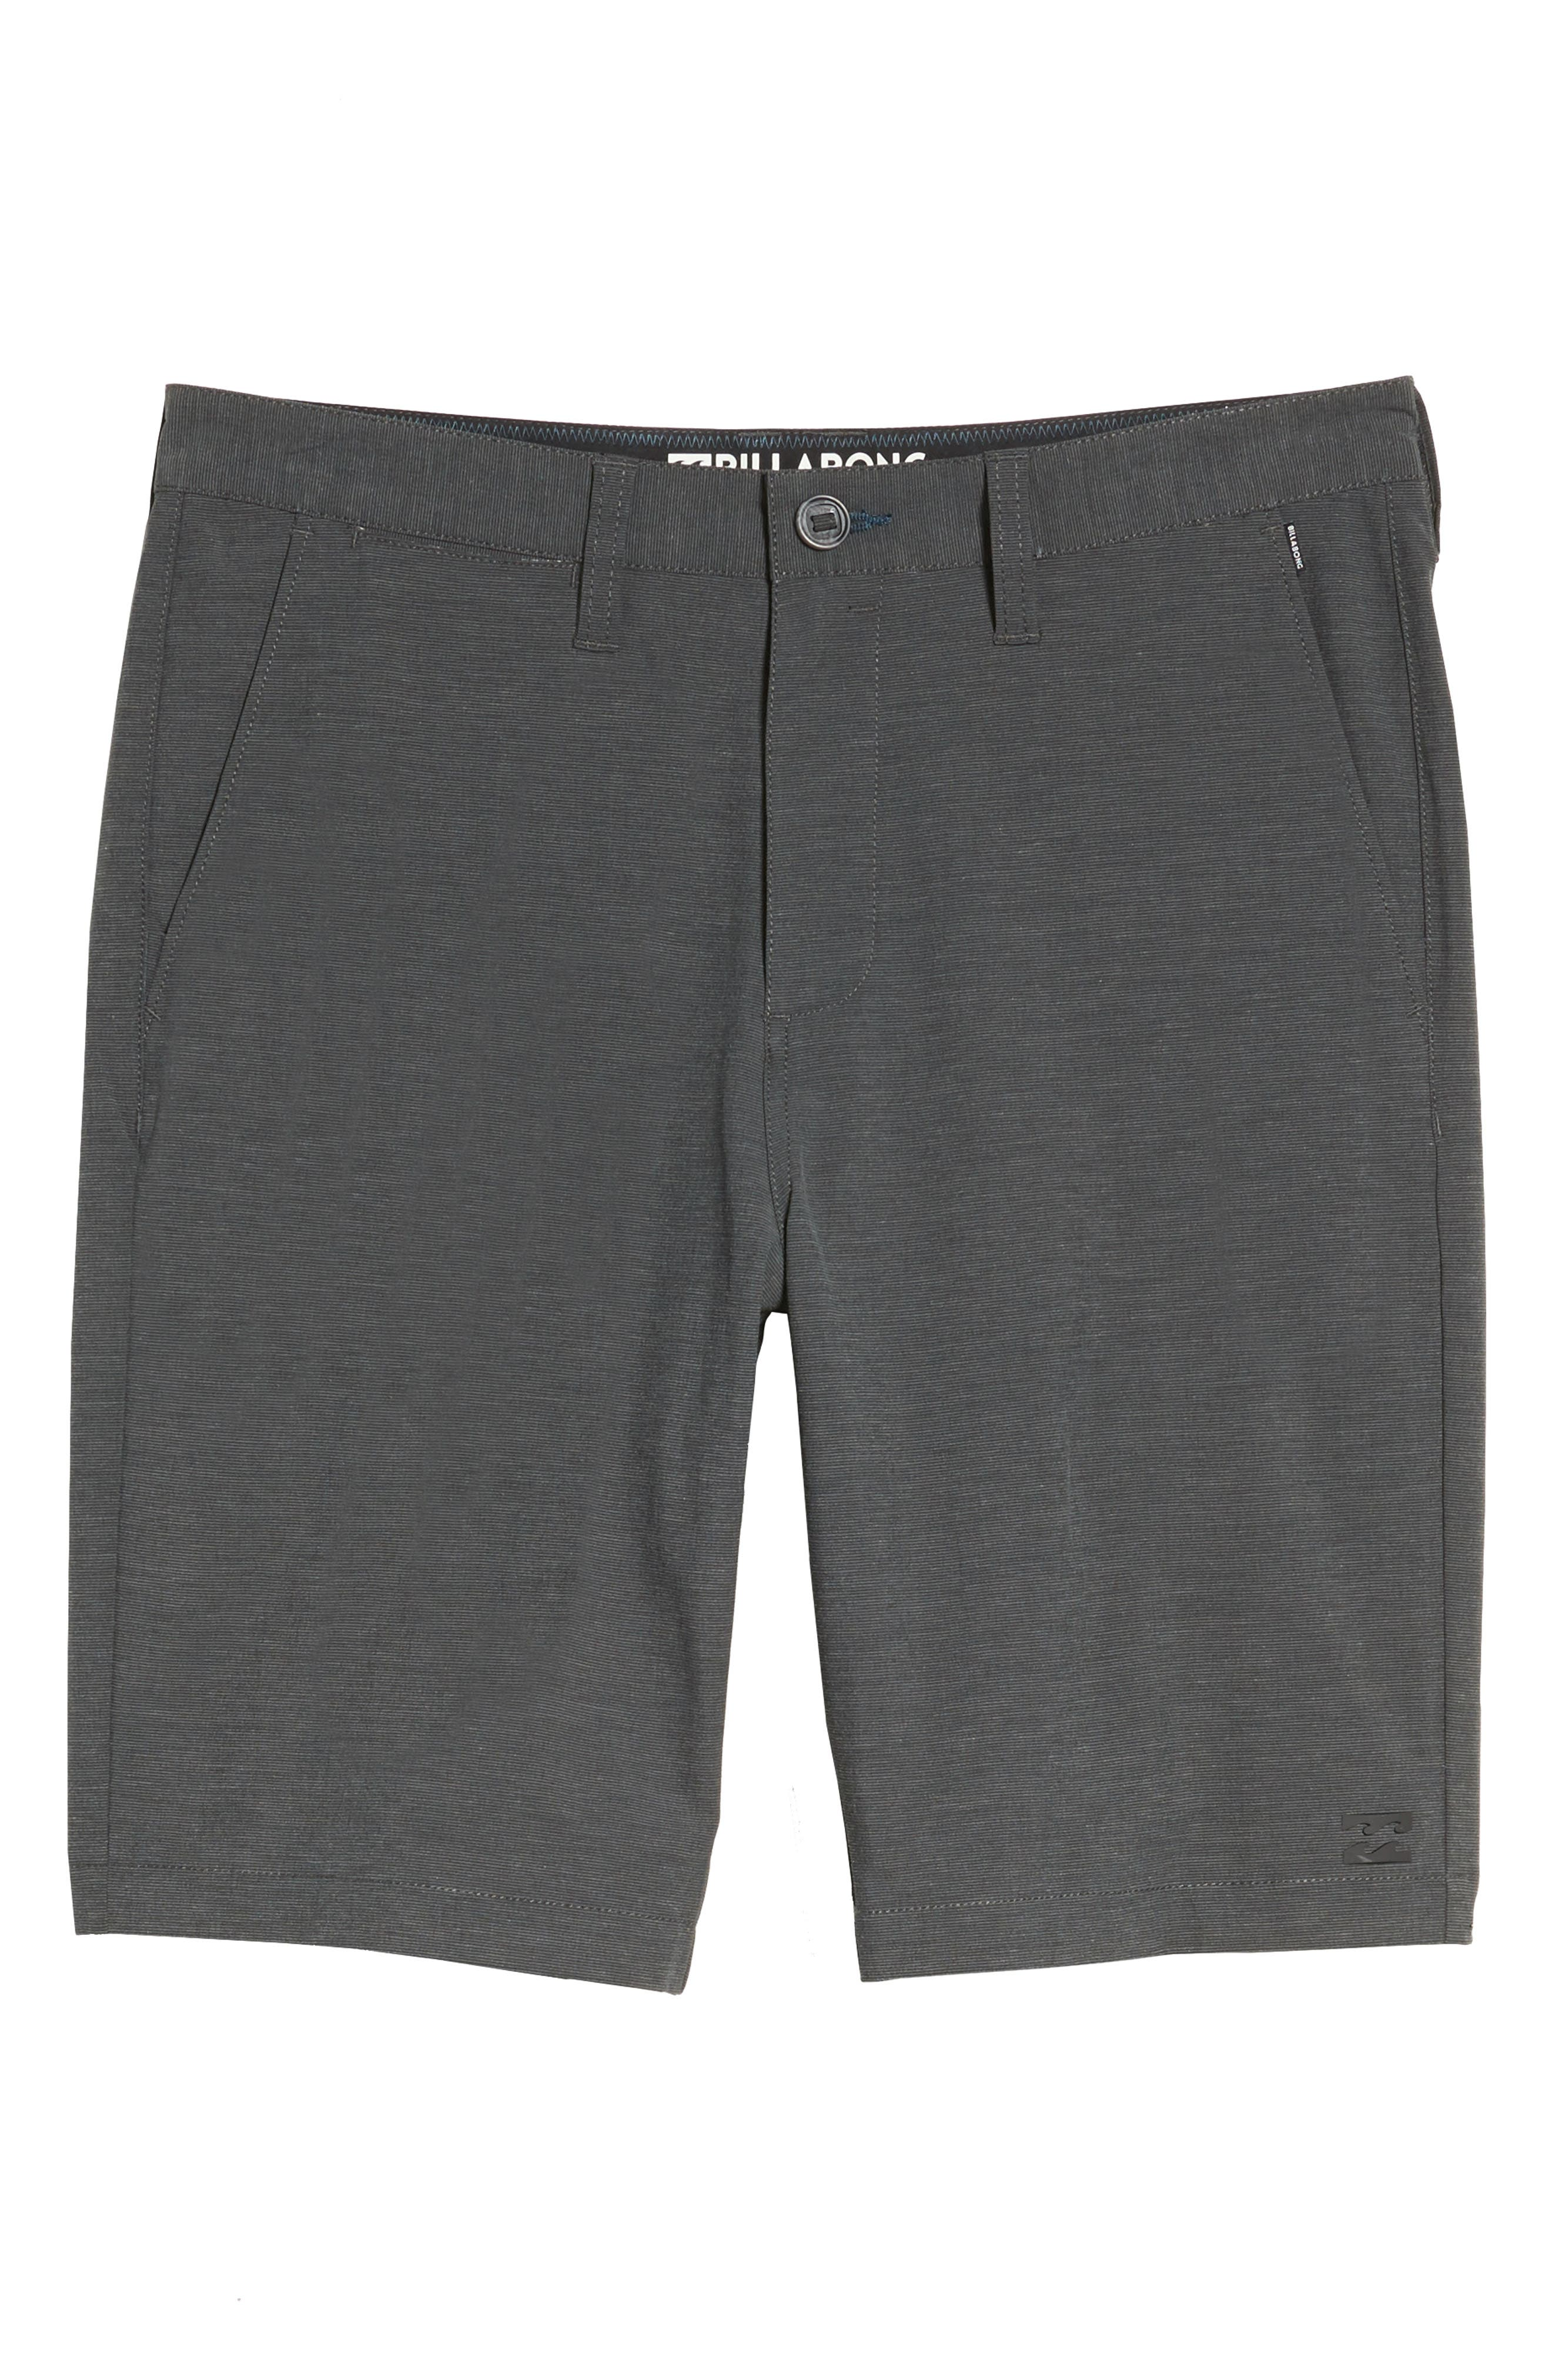 Crossfire X Hybrid Shorts,                             Alternate thumbnail 32, color,